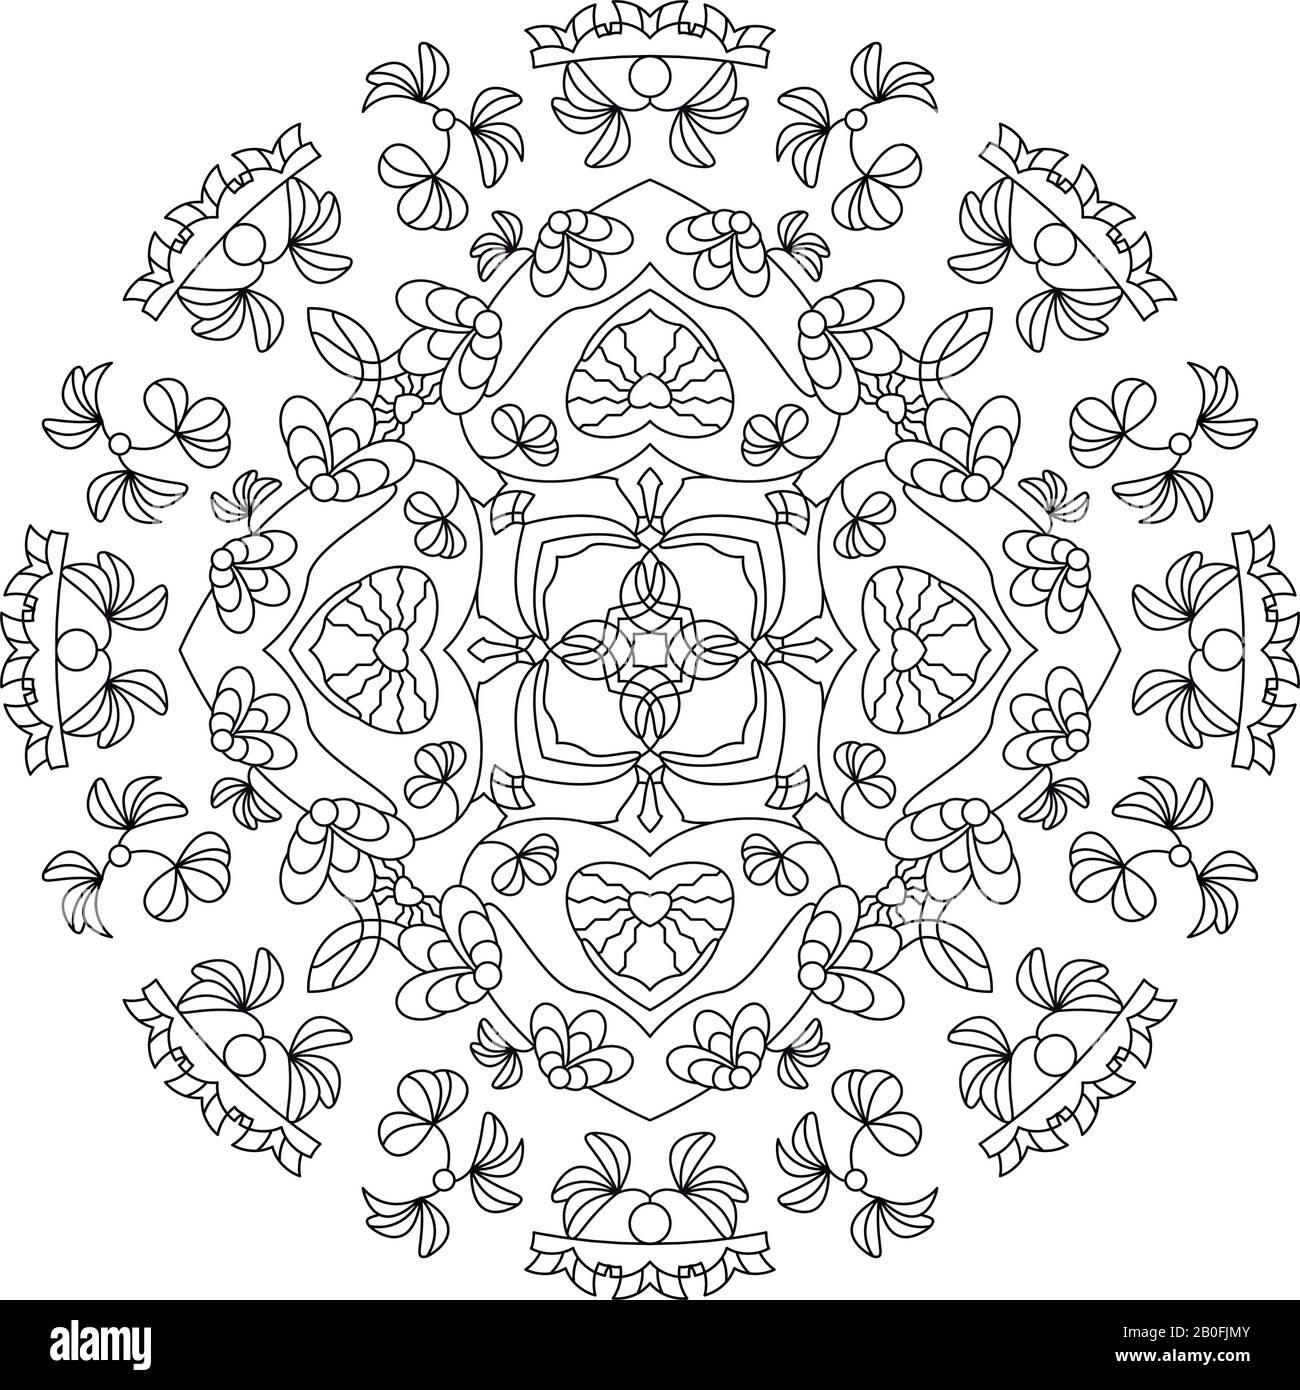 Mandala Coloring Page Hearts Mandala Illustration Vector Art Therapy Decorative Element Stock Vector Image Art Alamy